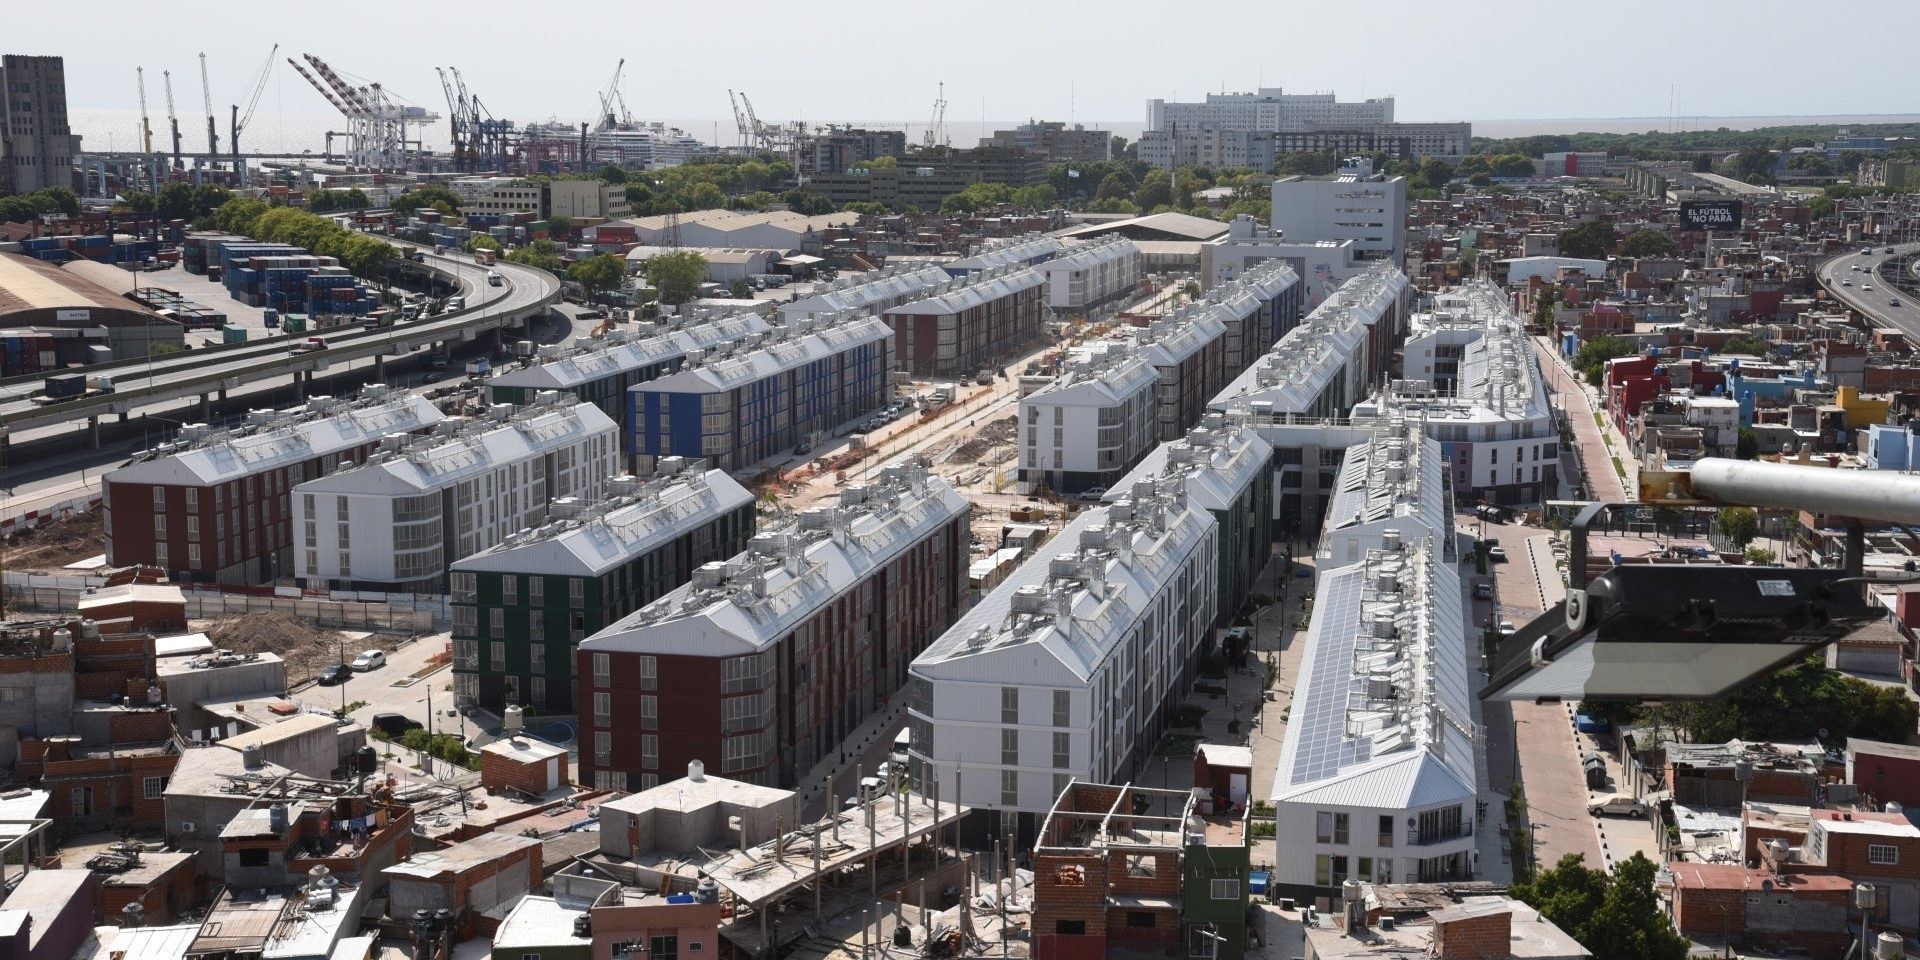 barrio 31 buenos aires argentina